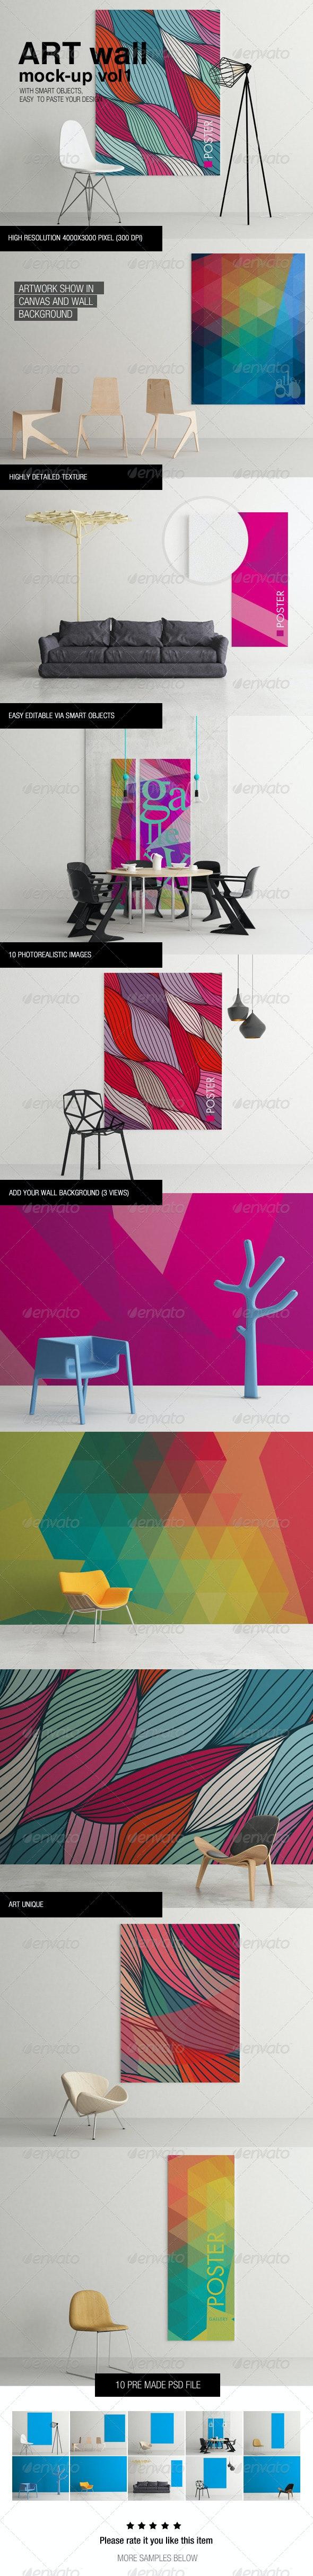 Art Wall Mock-up Vol.1 - Miscellaneous Displays